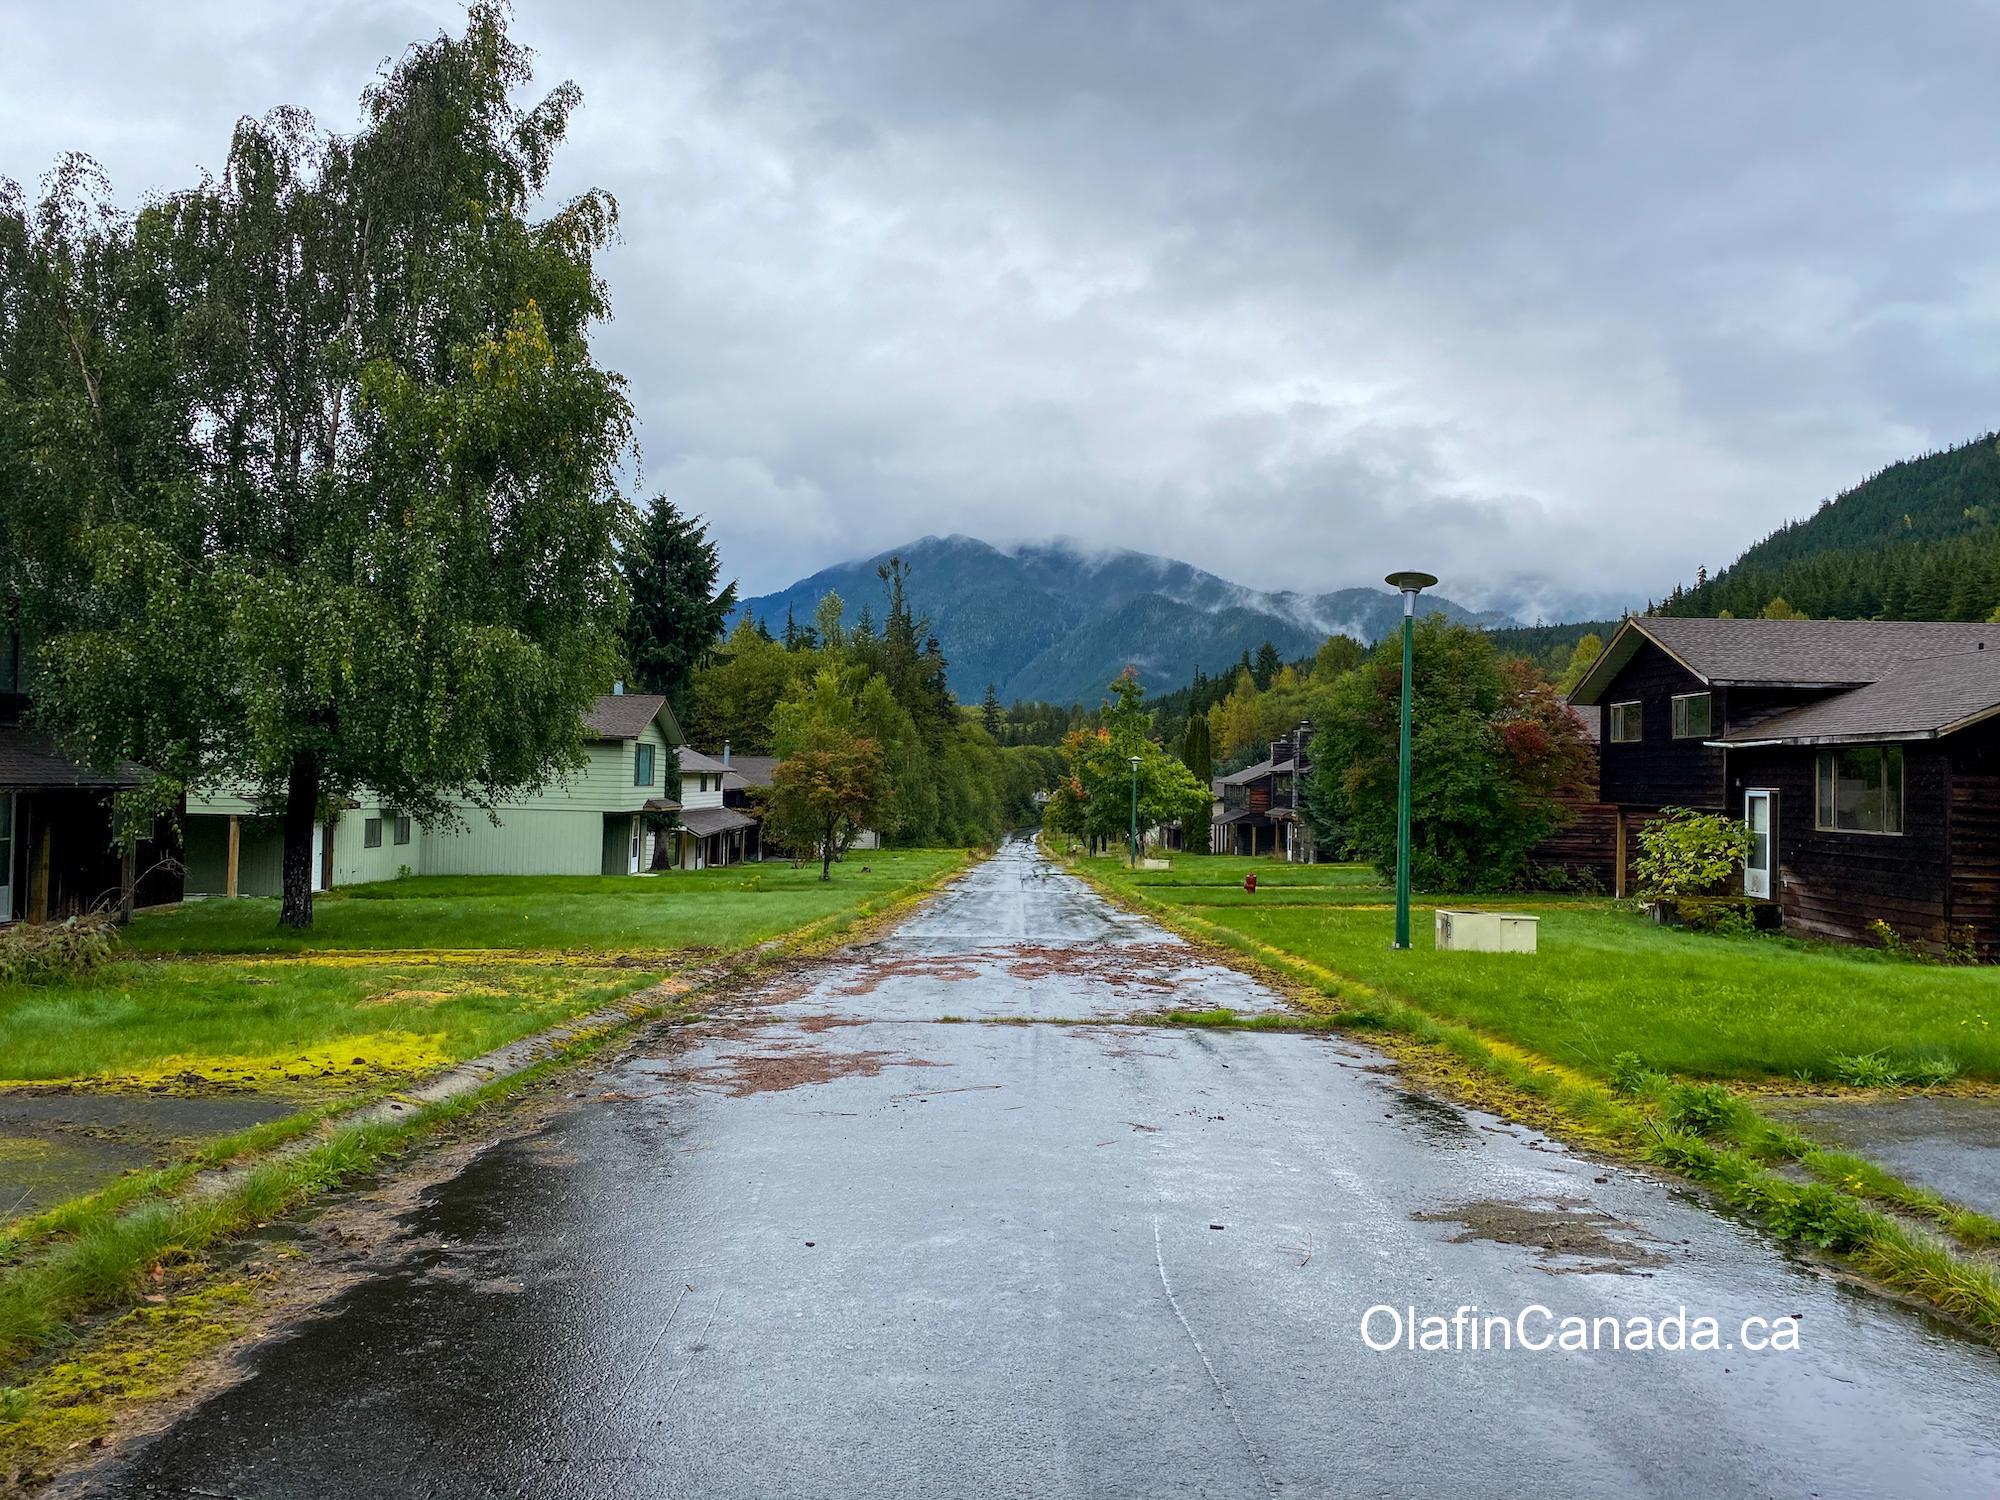 abandoned road in Kitsault BC #olafincanada #britishcolumbia #discoverbc #abandonedbc #kitsault